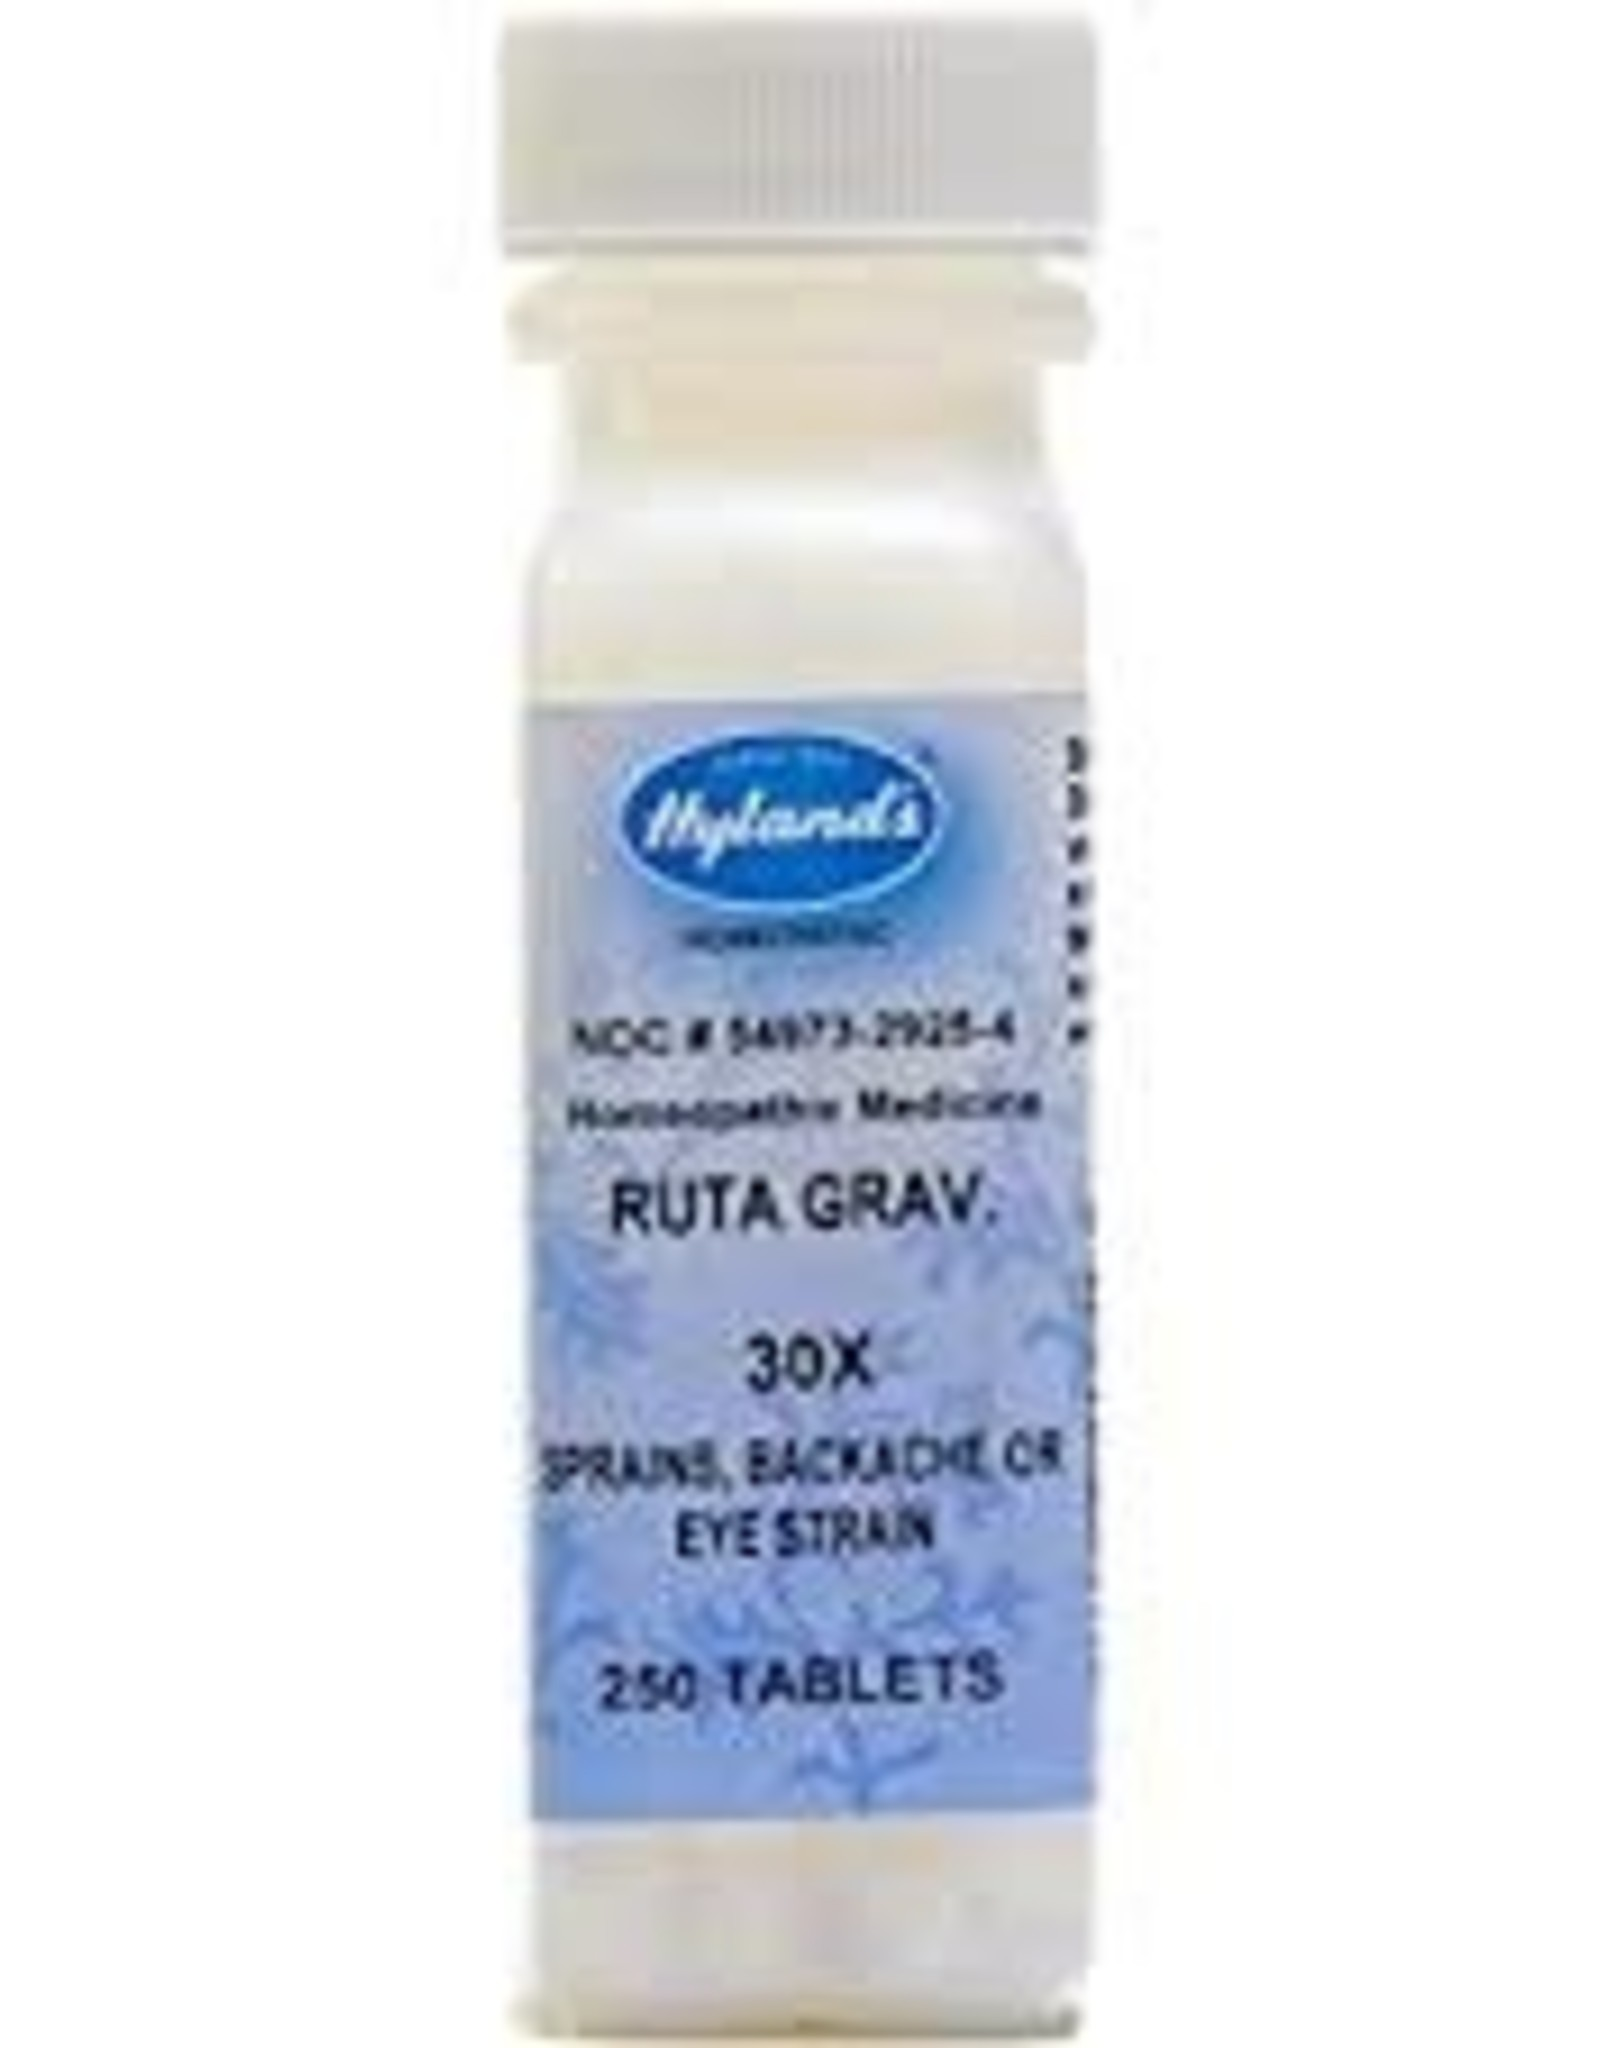 Hyland's Ruta Grav.